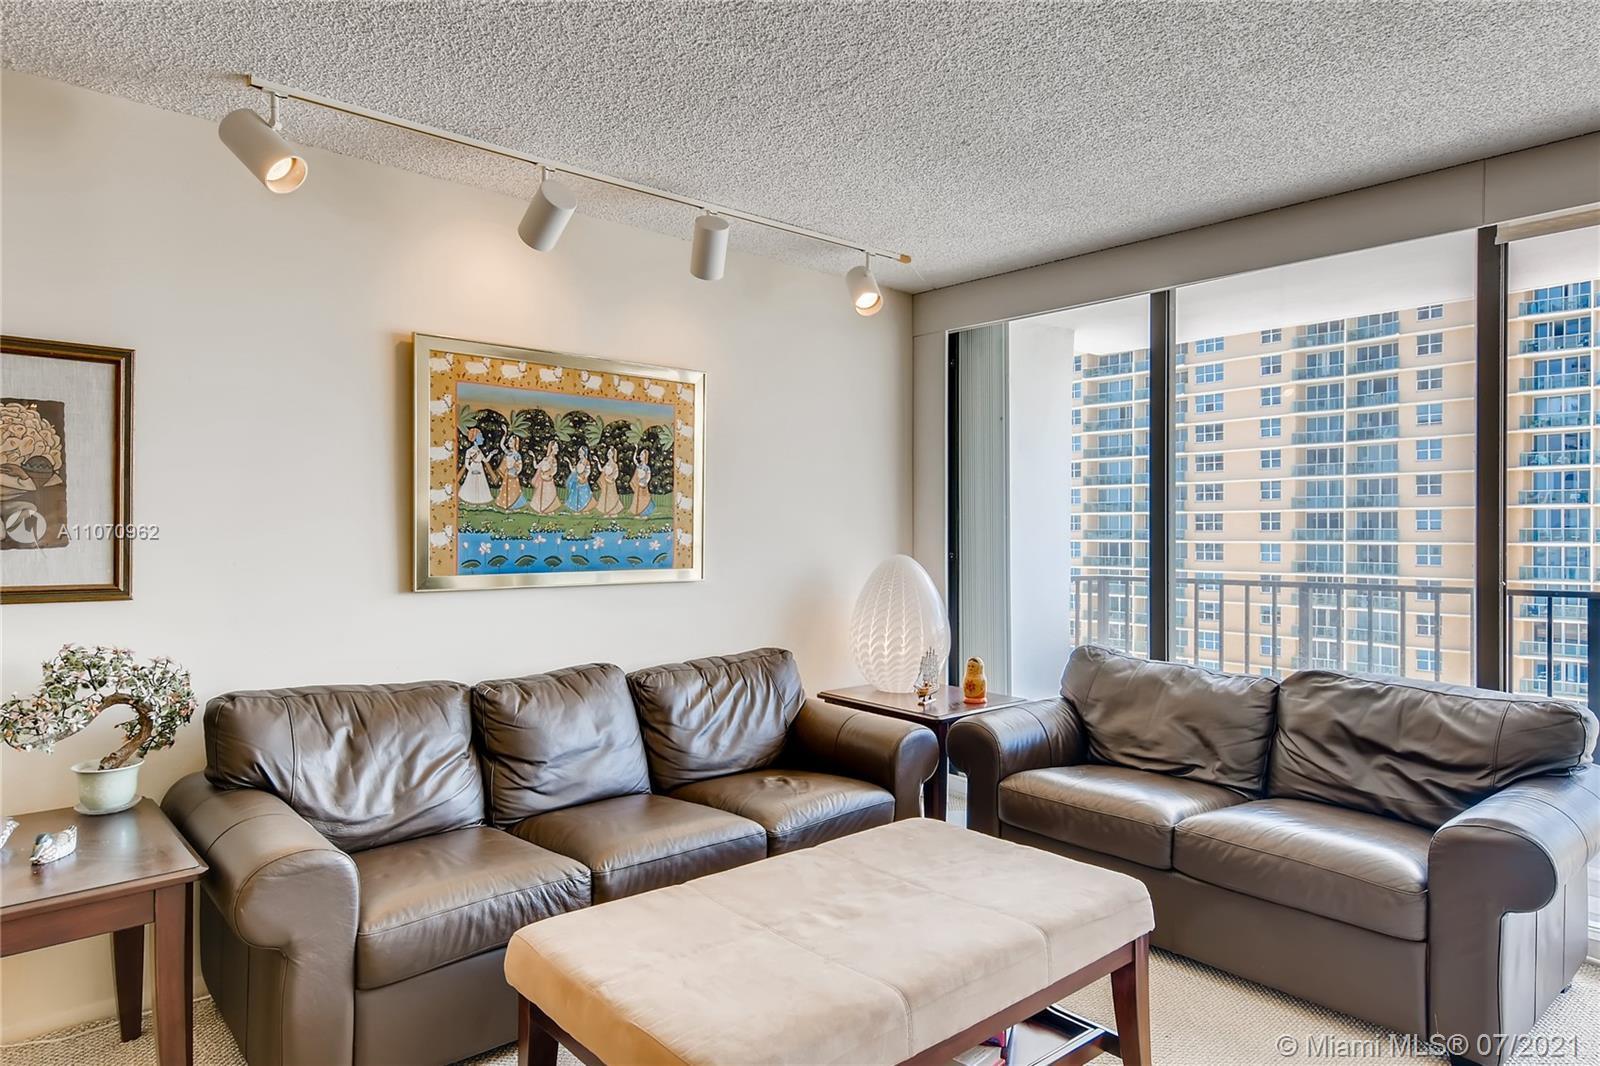 Oceanfront condo with Ocean, Intercoastal and City views. 2 bedroom 2 bath unit. Listen to the Ocean